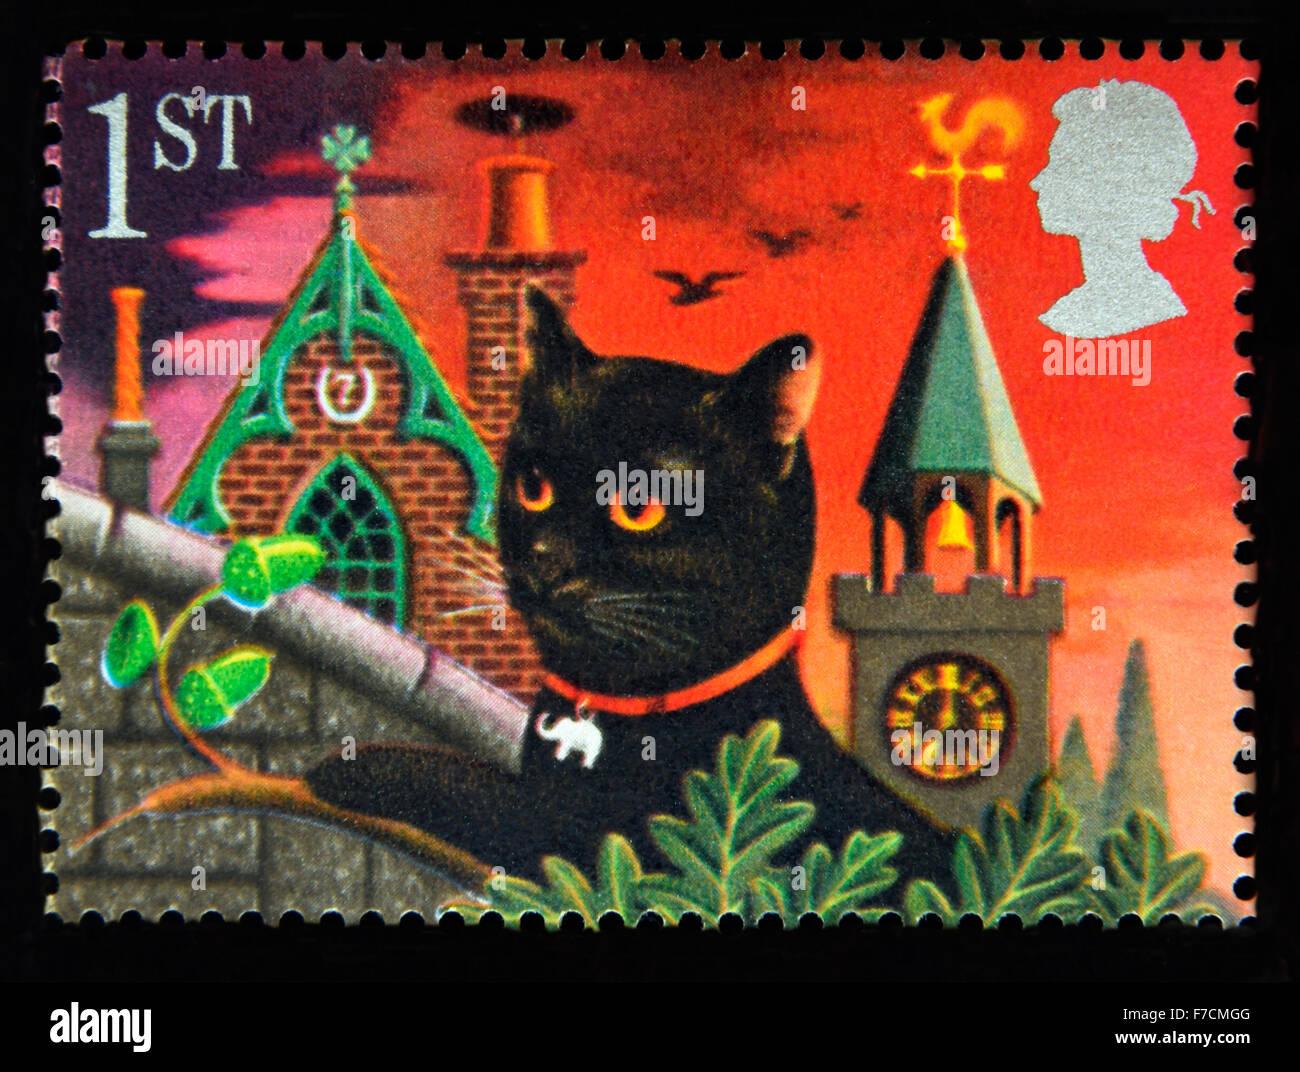 Postage stamp. Great Britain. Queen Elizabeth II. 1991. Greetings Stamps, 'Good Luck'. Black Cat. - Stock Image